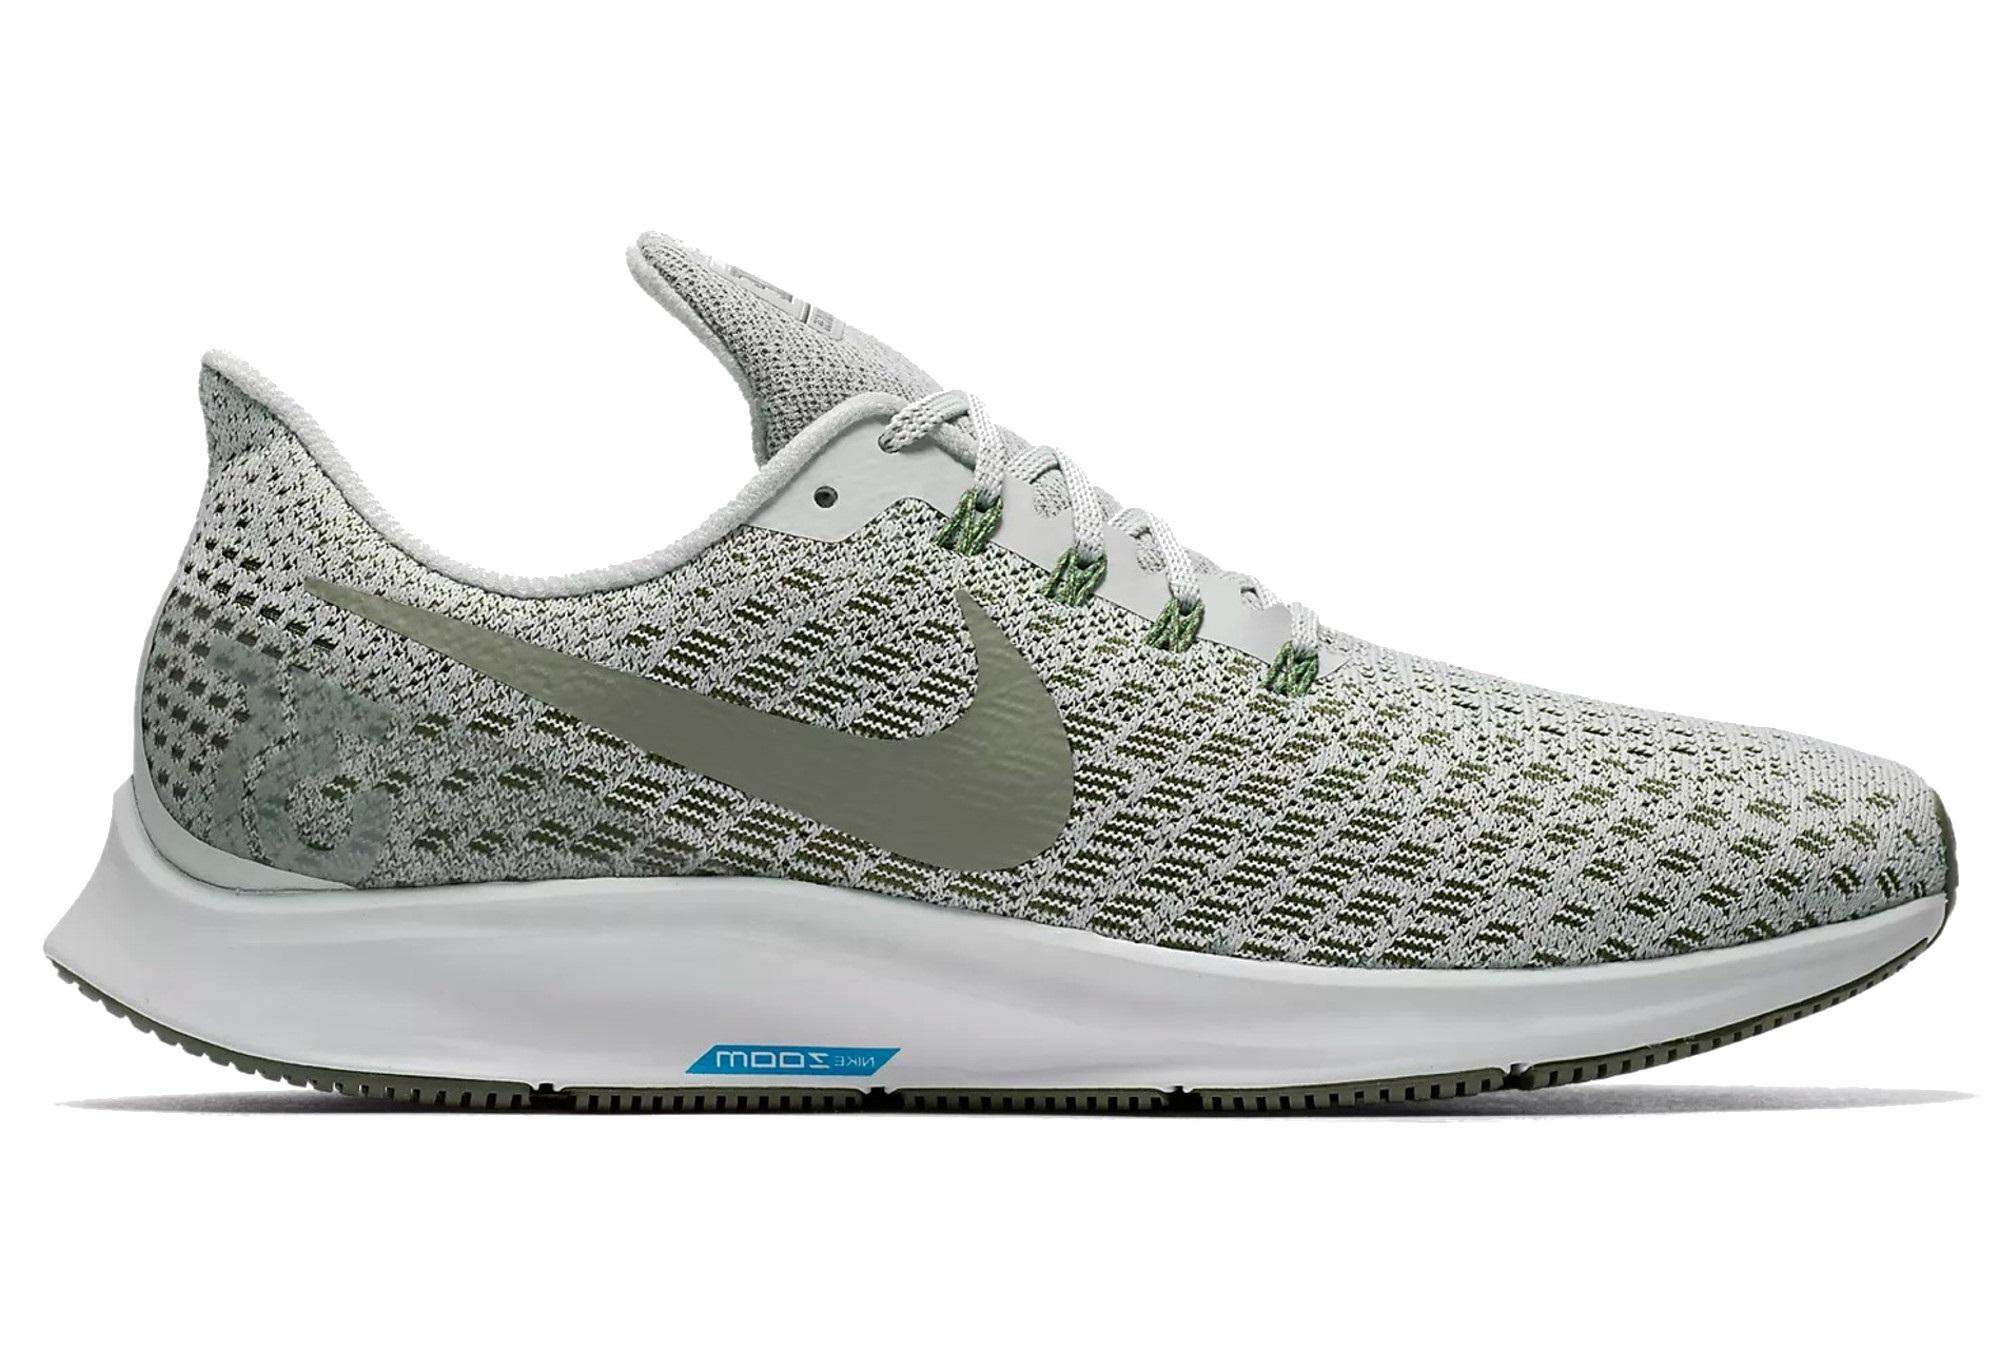 cheap for discount 70f15 80e40 Chaussures de Running Nike Air Zoom Pegasus 35 Argent   Vert